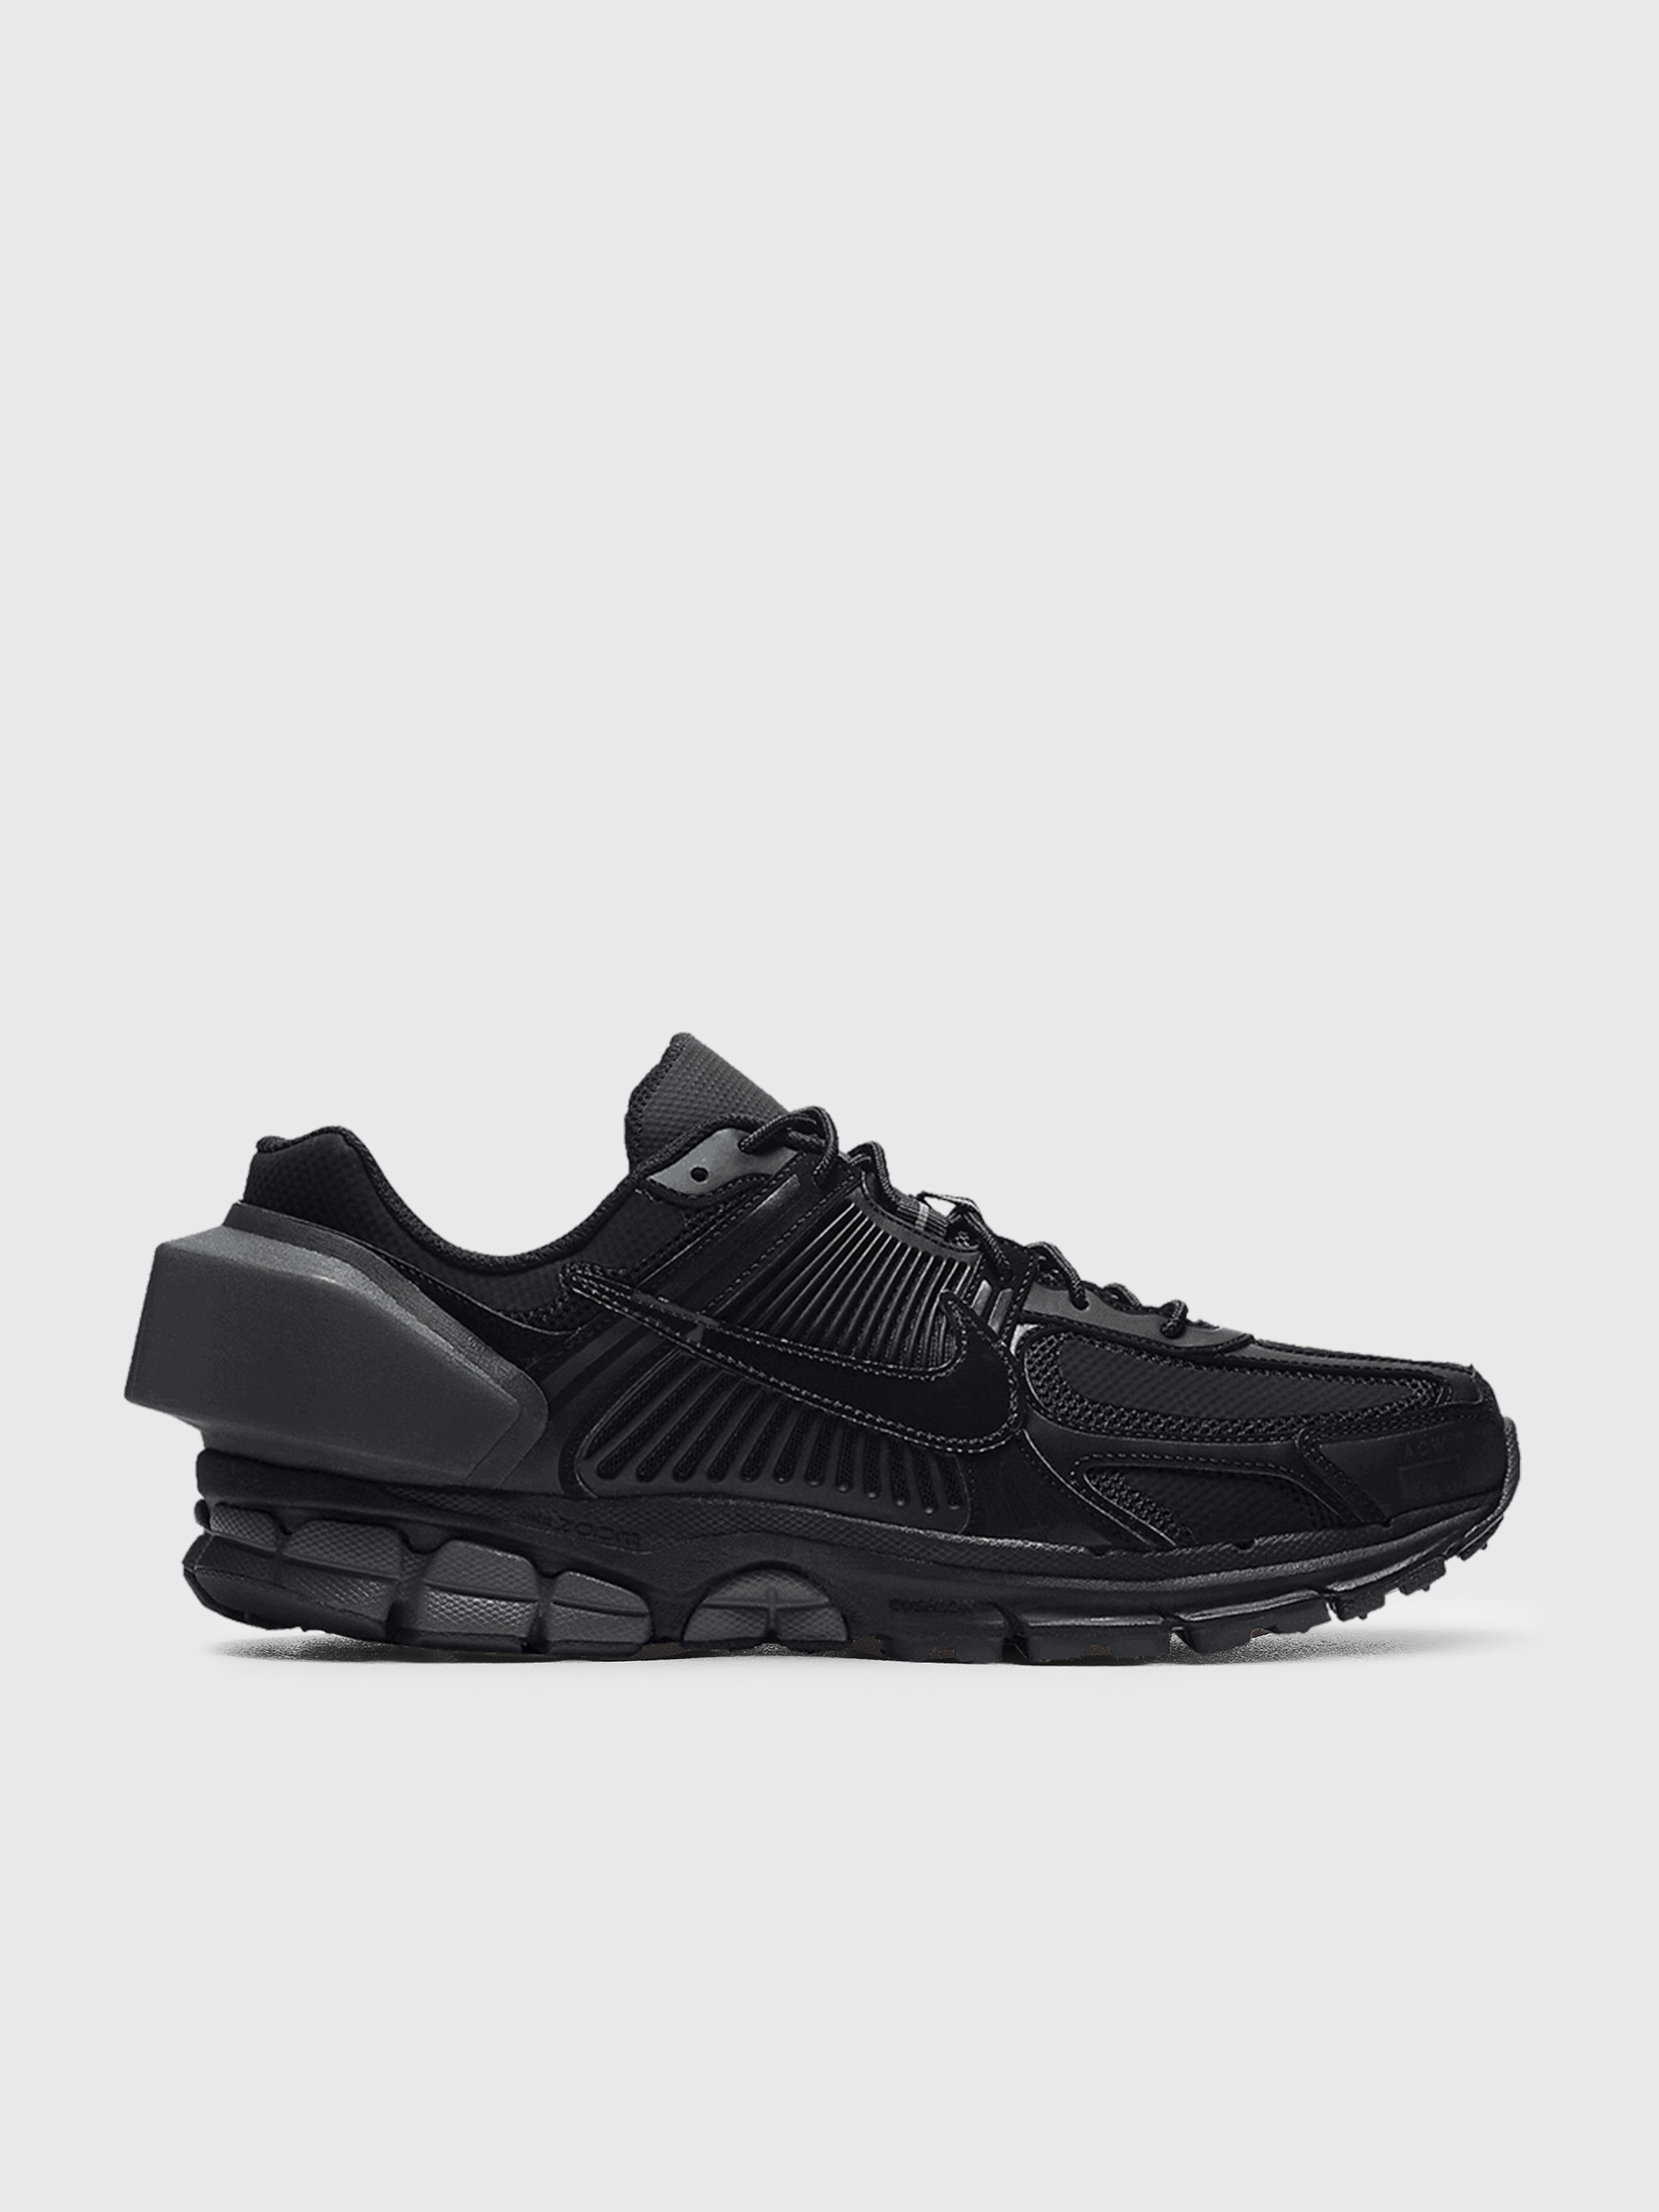 60a4d9983b8 Très Bien - Nike x A-Cold-Wall  Zoom Vomero 5 Black   Reflect Silver